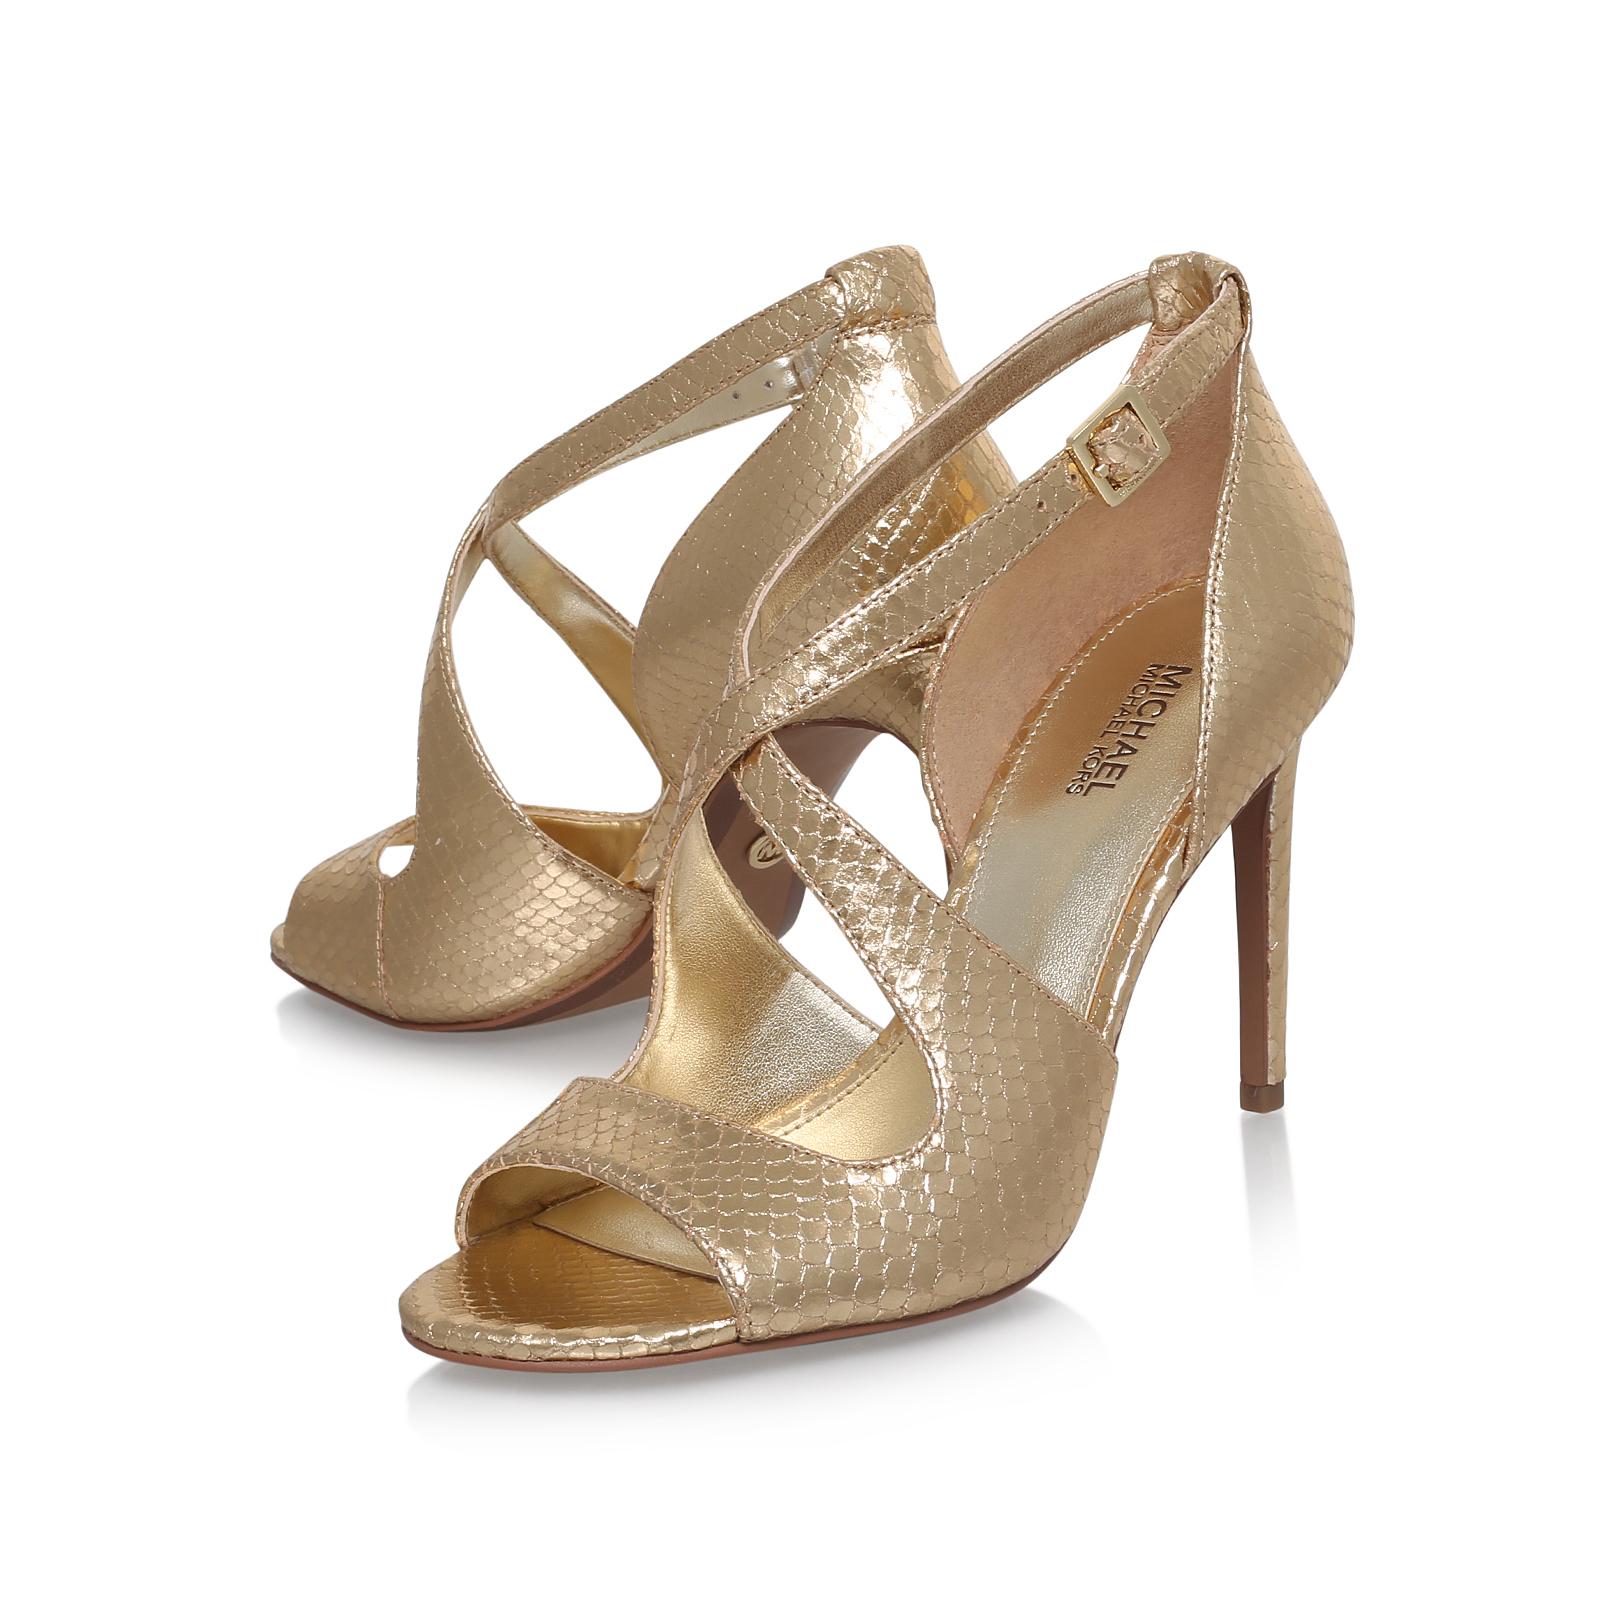 estee sandal michael michael kors estee gold high heel. Black Bedroom Furniture Sets. Home Design Ideas